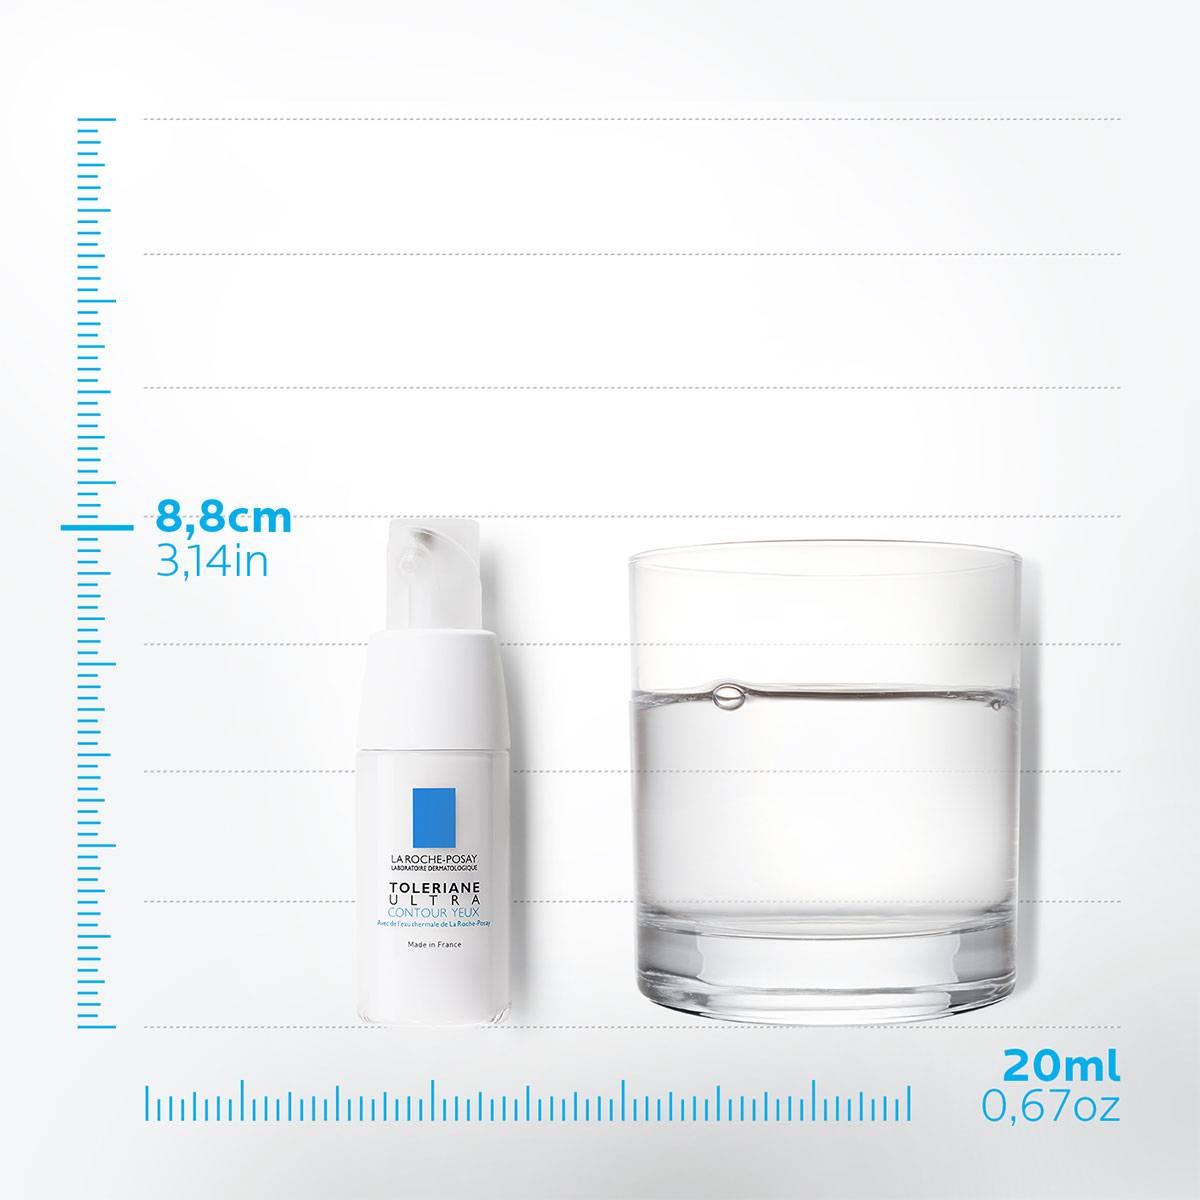 La Roche Posay ProductPage Toleriane Ultra Eye Contour 20ml 3337872419